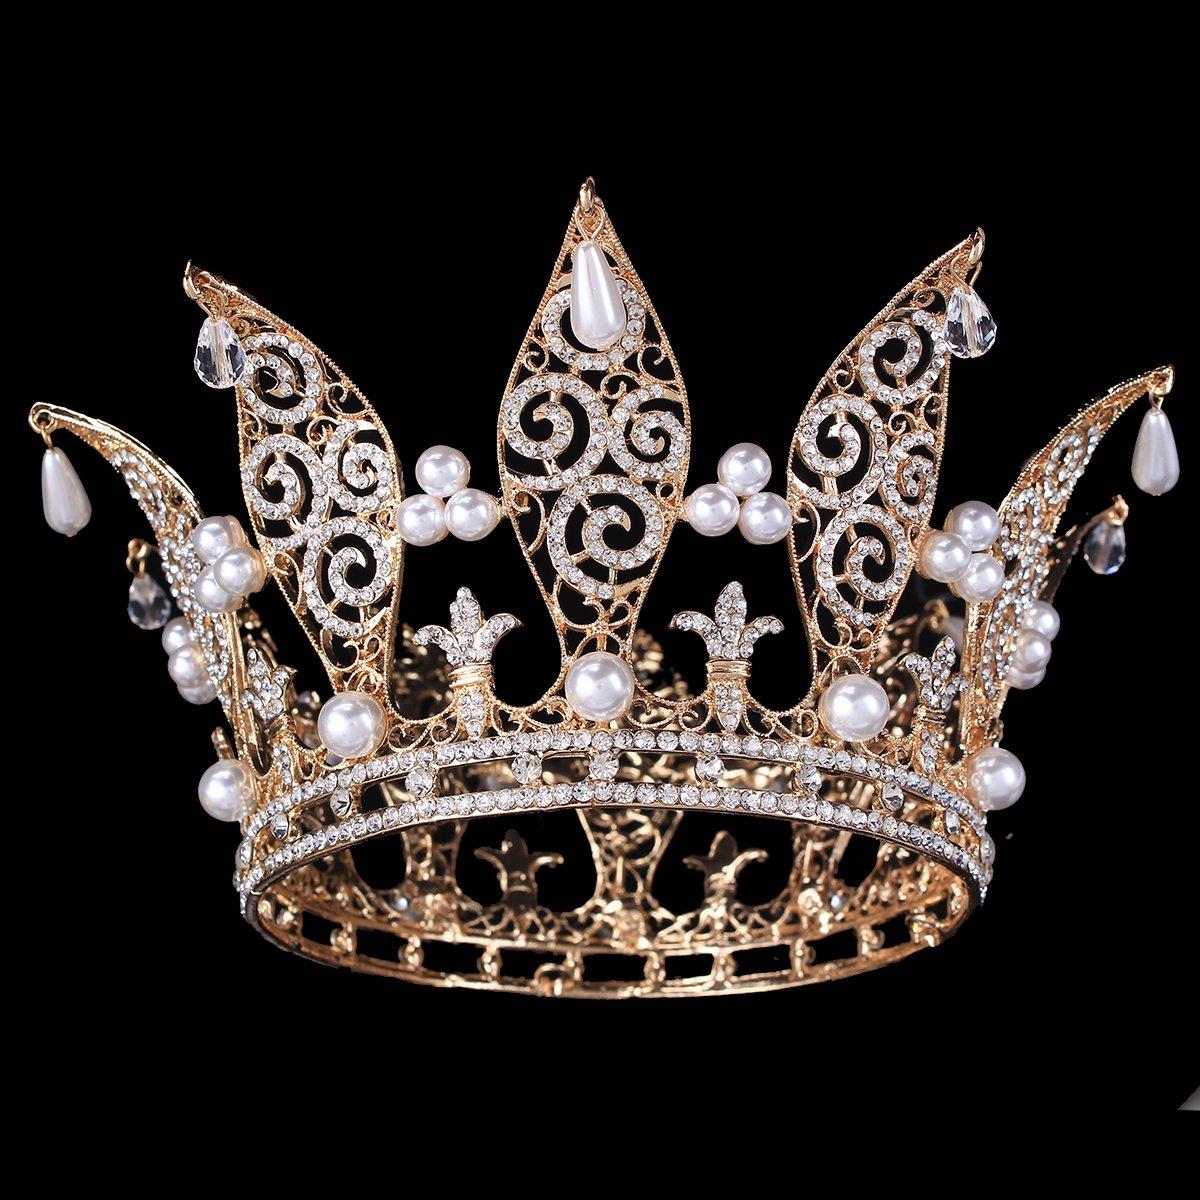 FUMUD 3.1'' Gold Plate Bridal Tiara Crown Flower Headband Wedding headpiece Queen Crown Full Crown